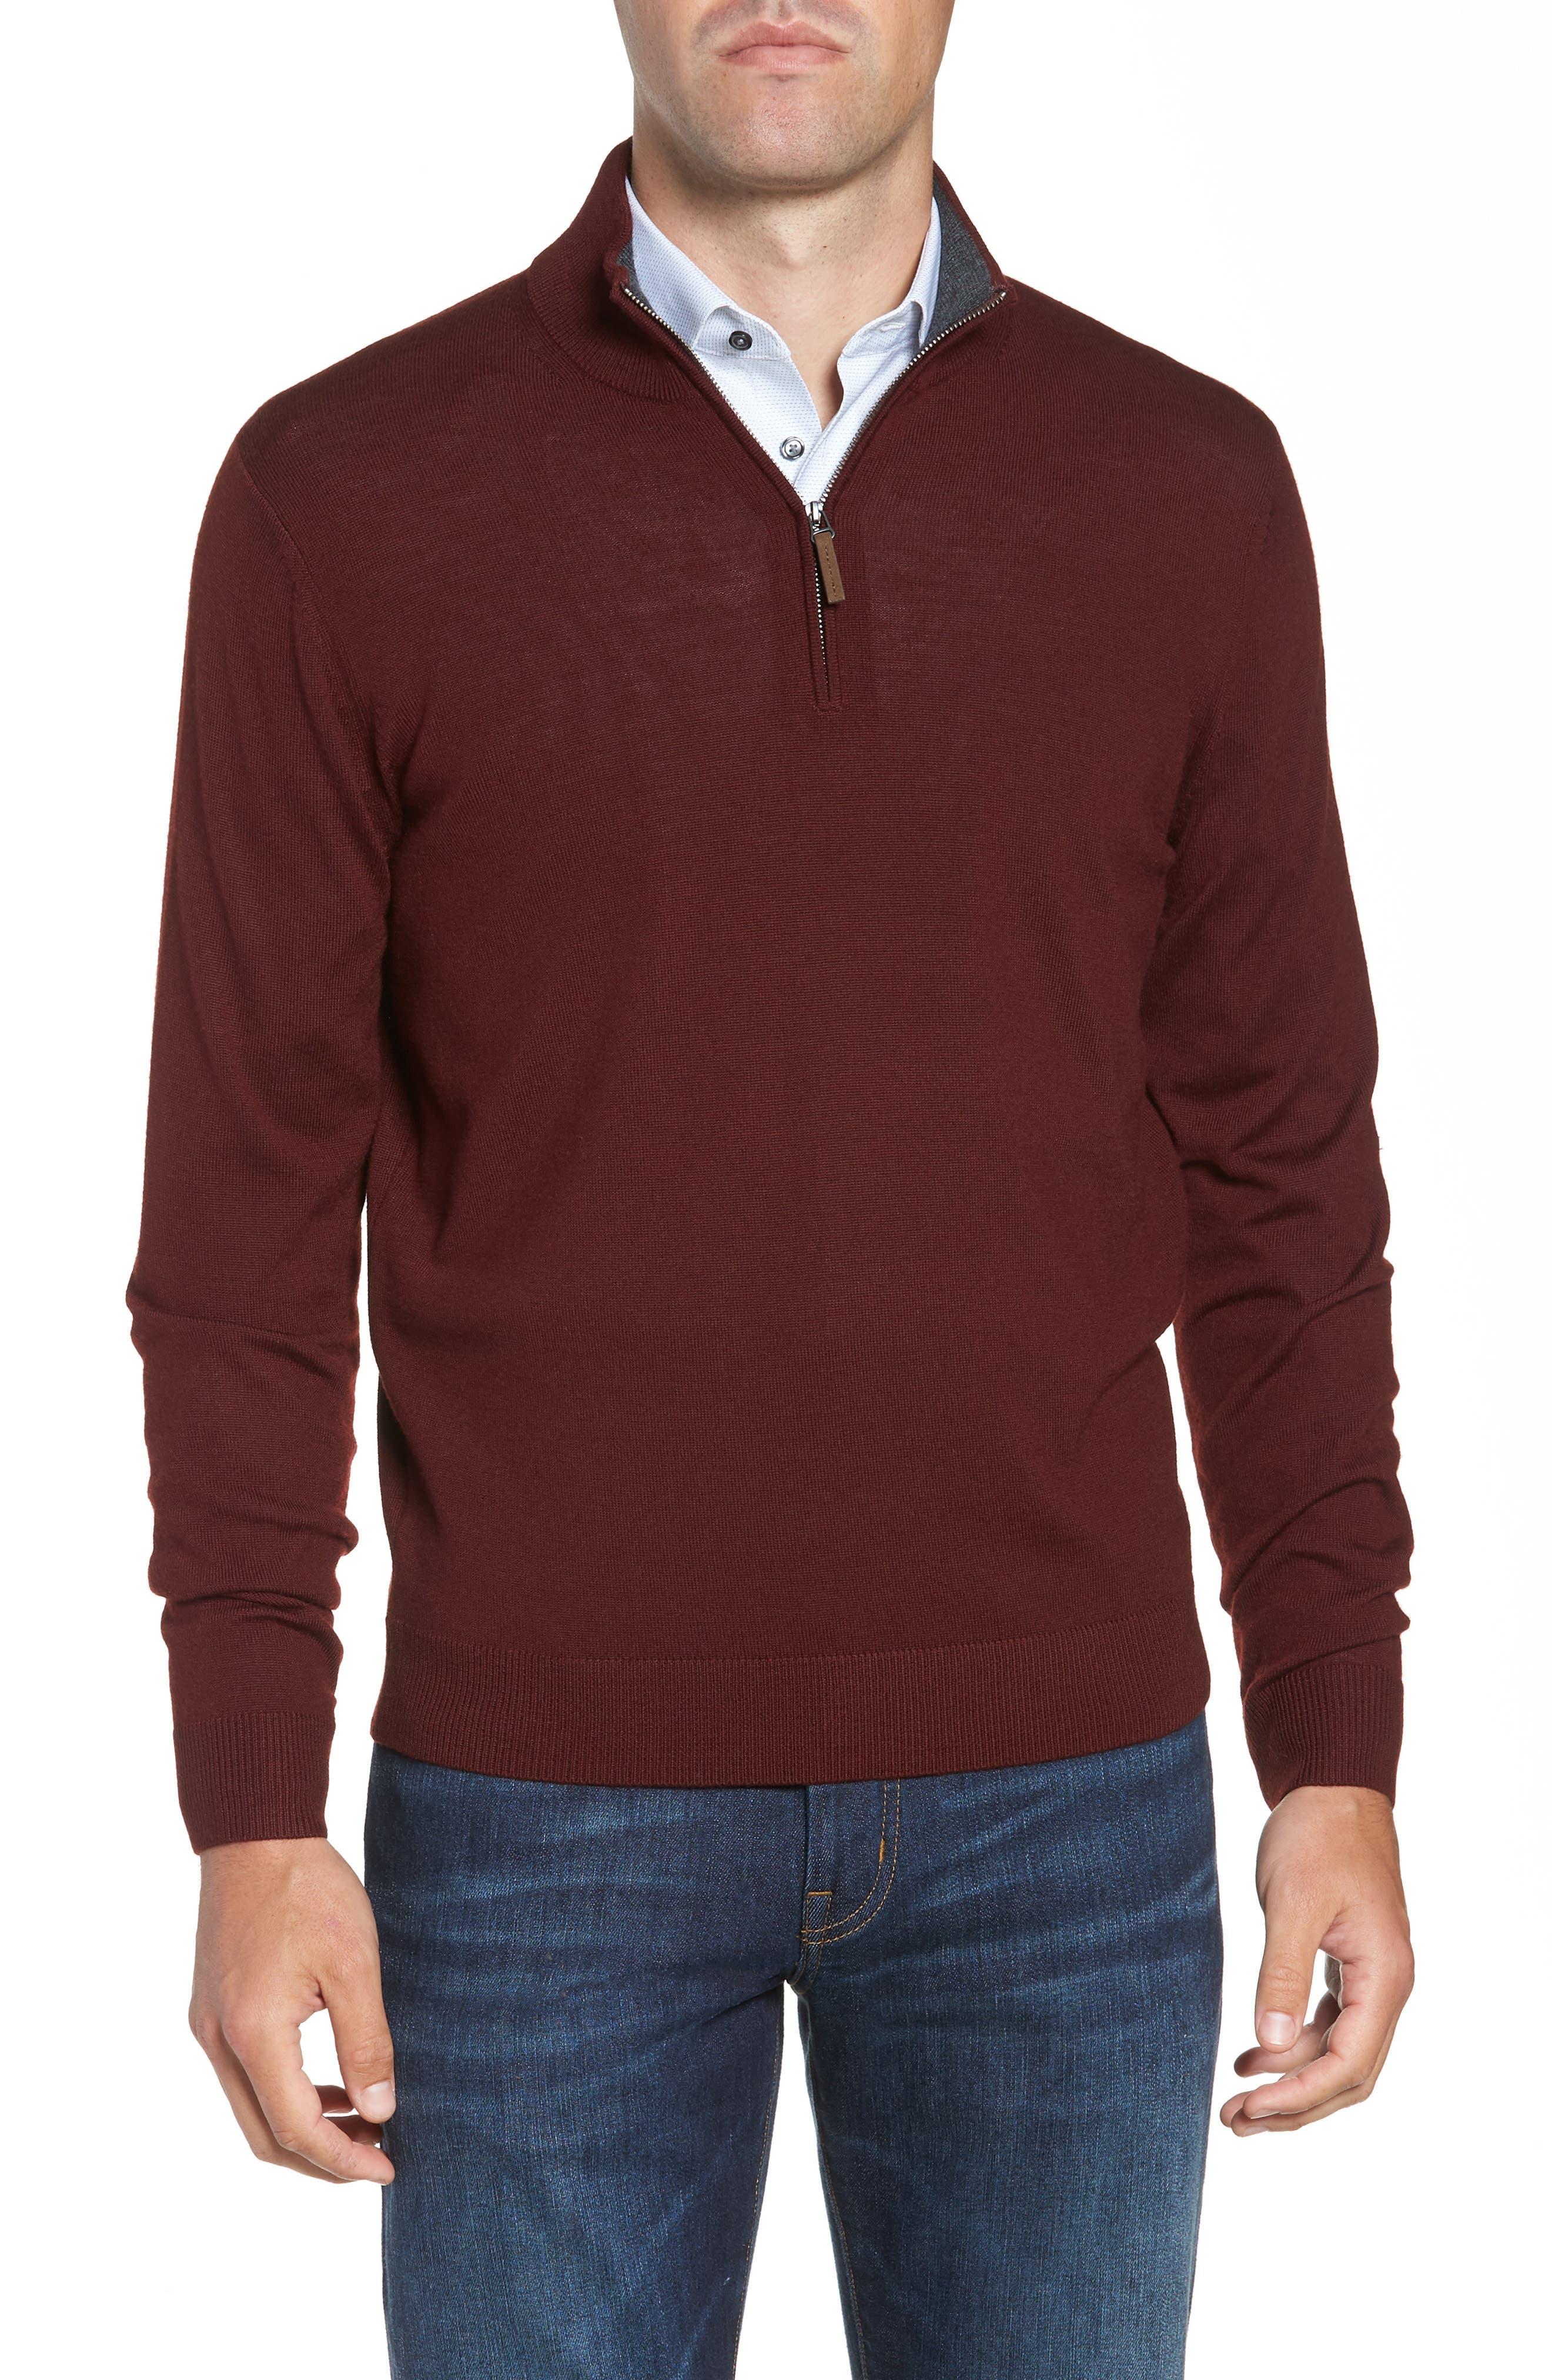 Quarter Zip Wool Pullover,                             Main thumbnail 1, color,                             BURGUNDY ROYALE